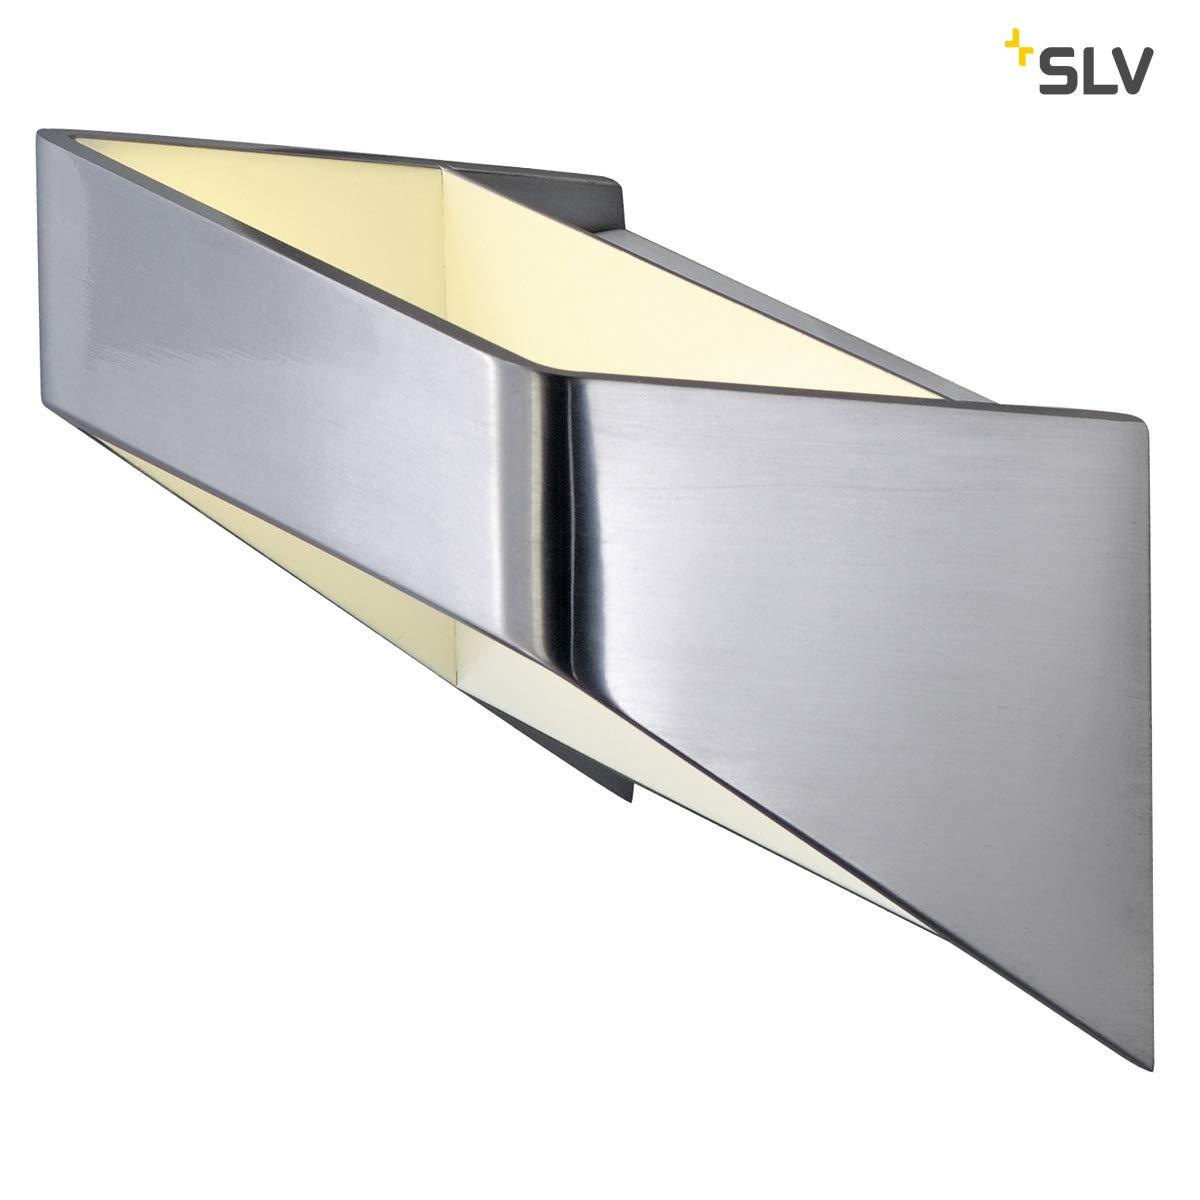 SLV DACU SPACE SPACE SPACE Leuchte Aluminium Silber 47bfb3